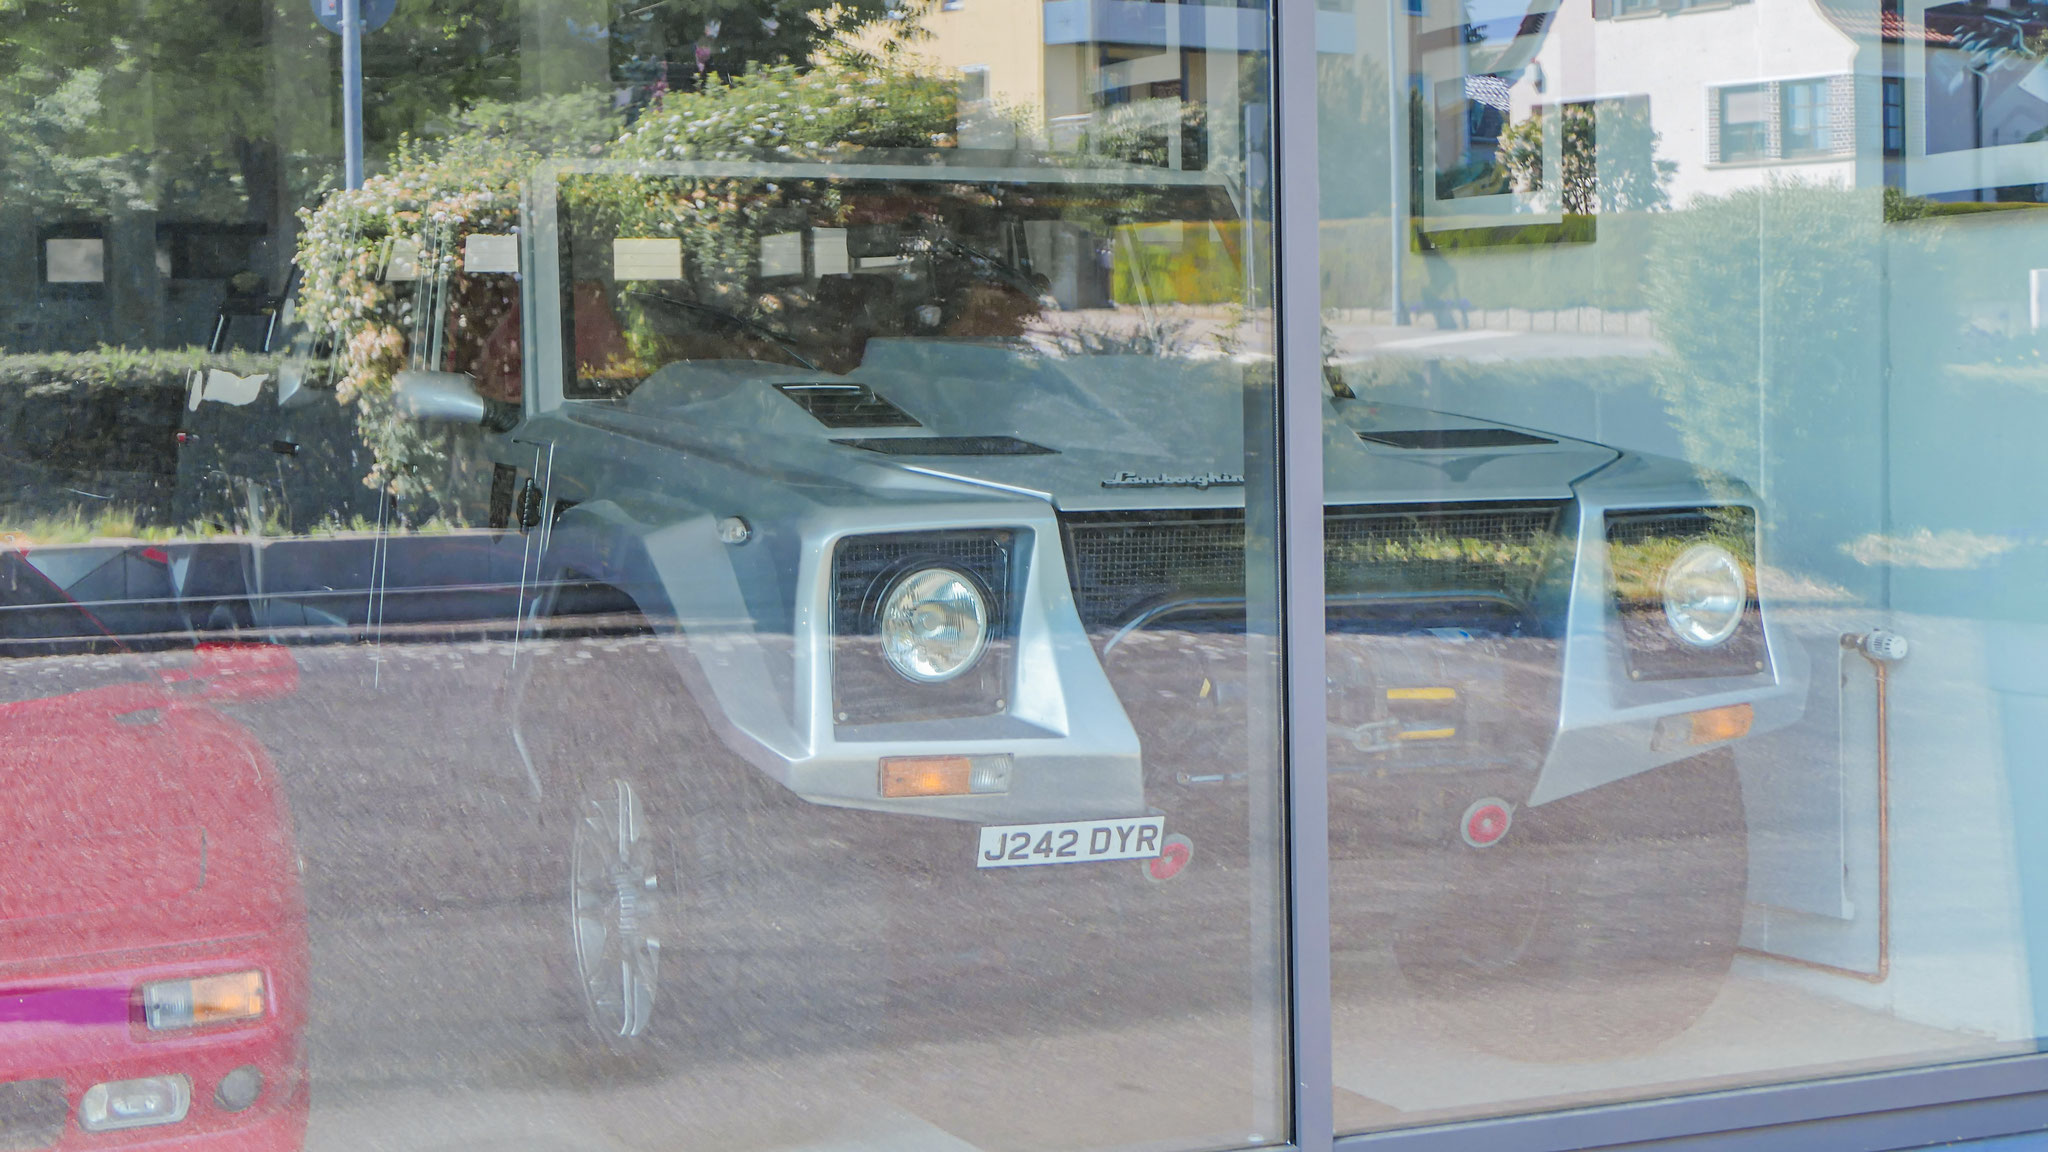 Lamborghini LM002 - J242-DYR (GB)